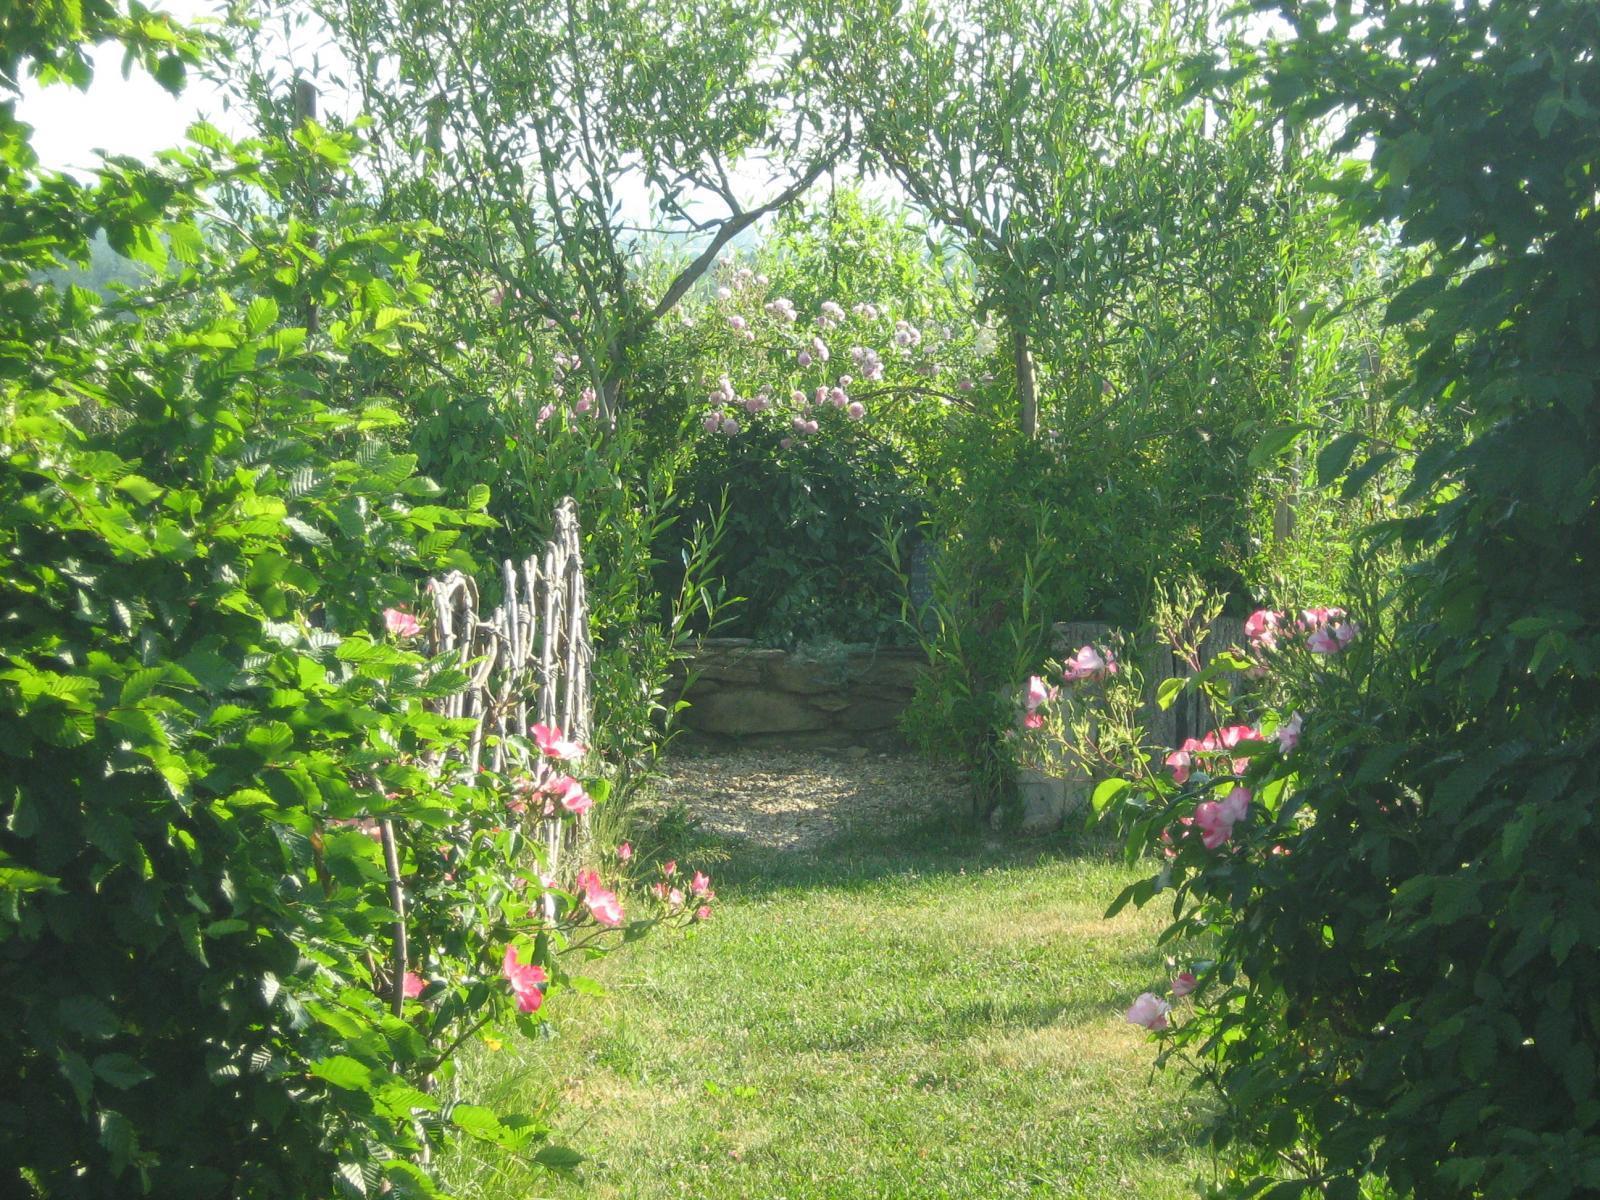 Parcs jardins botaniques arboretums tarn 81 page 2 for Jardin 81